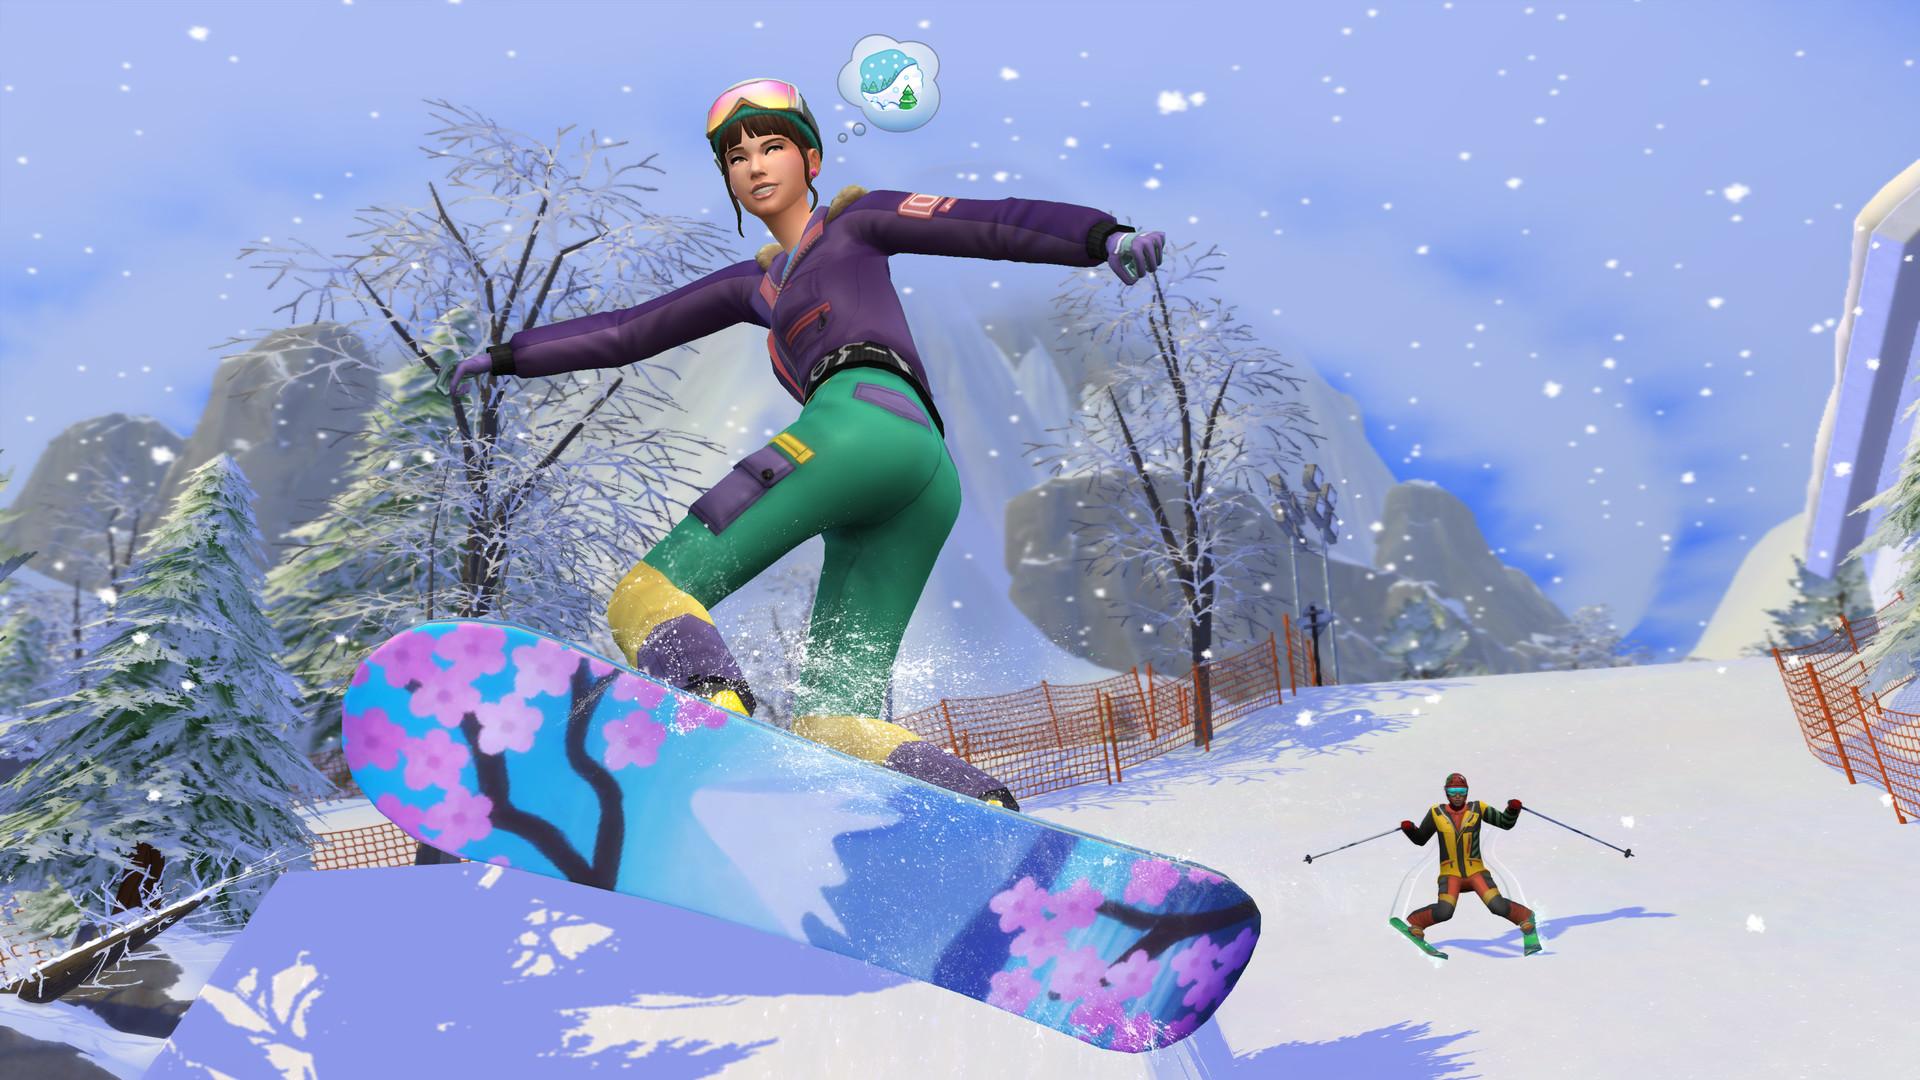 The Sims 4: Snowy Escape DLC License Key